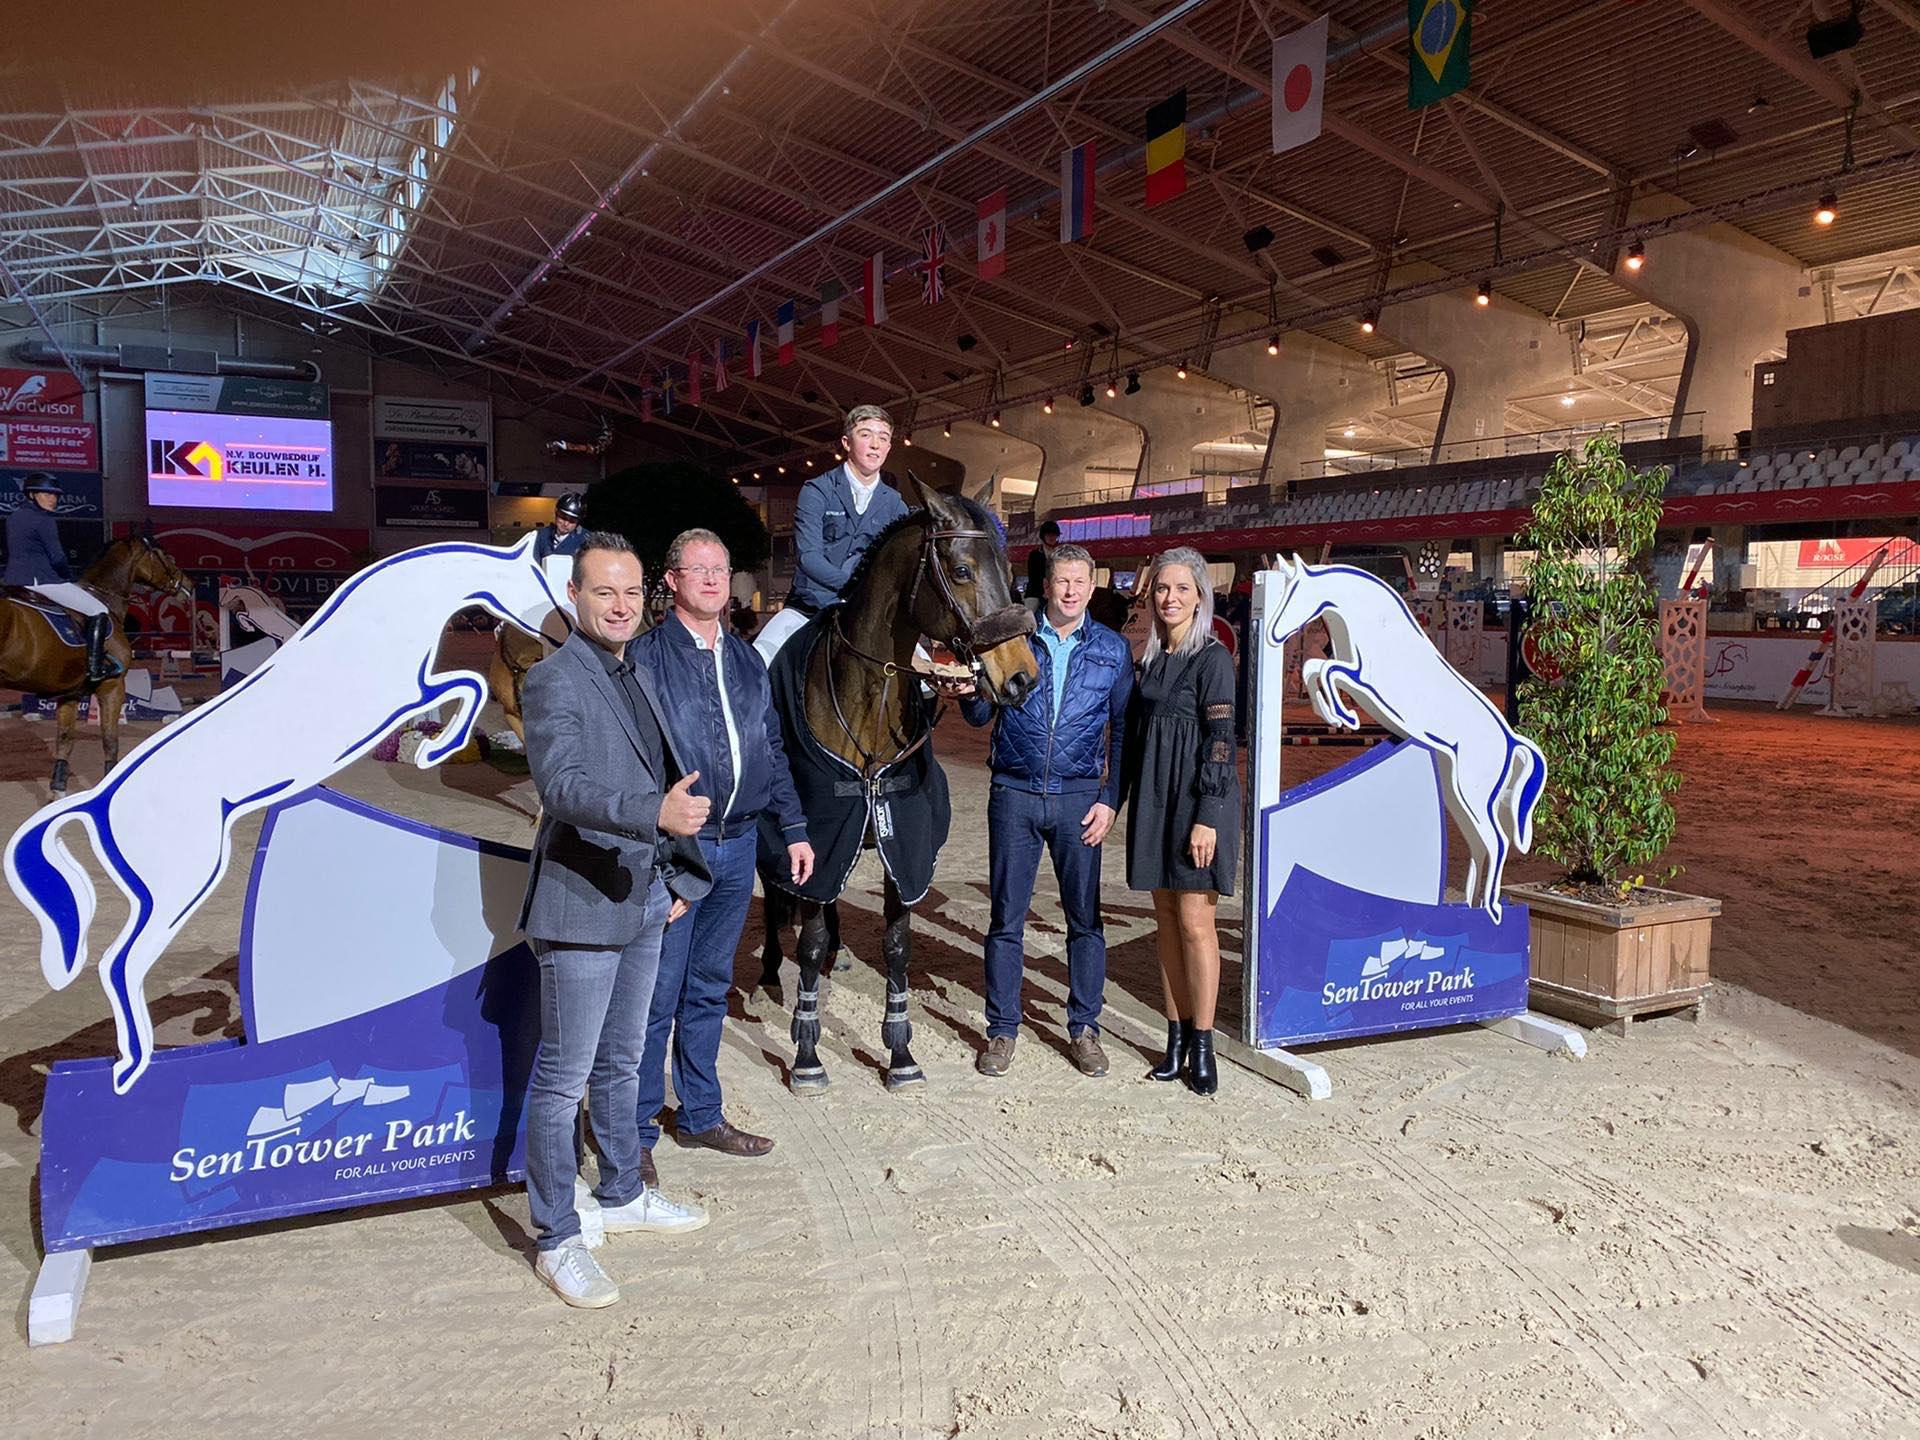 Gilles Thomas schittert op Grand Prix podium in Opglabbeek - equnews.be